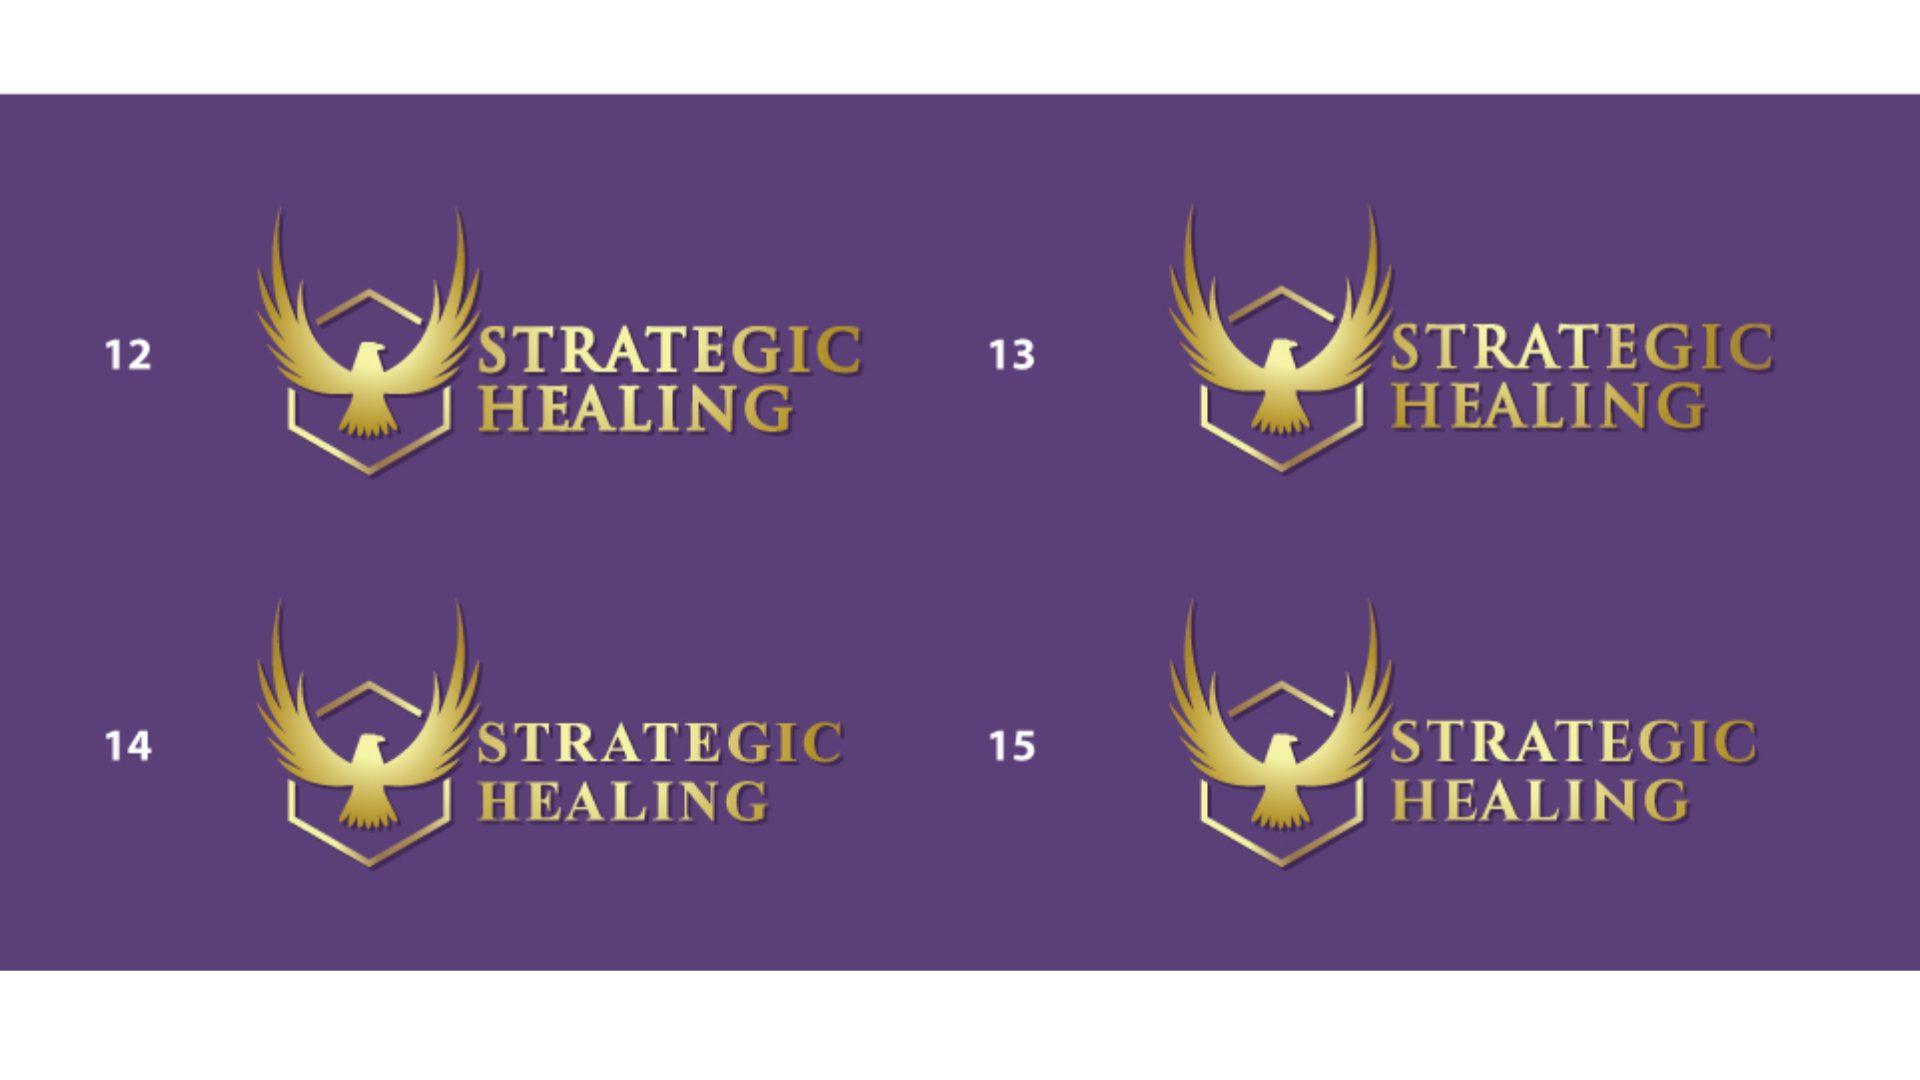 Strategic Healing - Eagle Concept 12-15